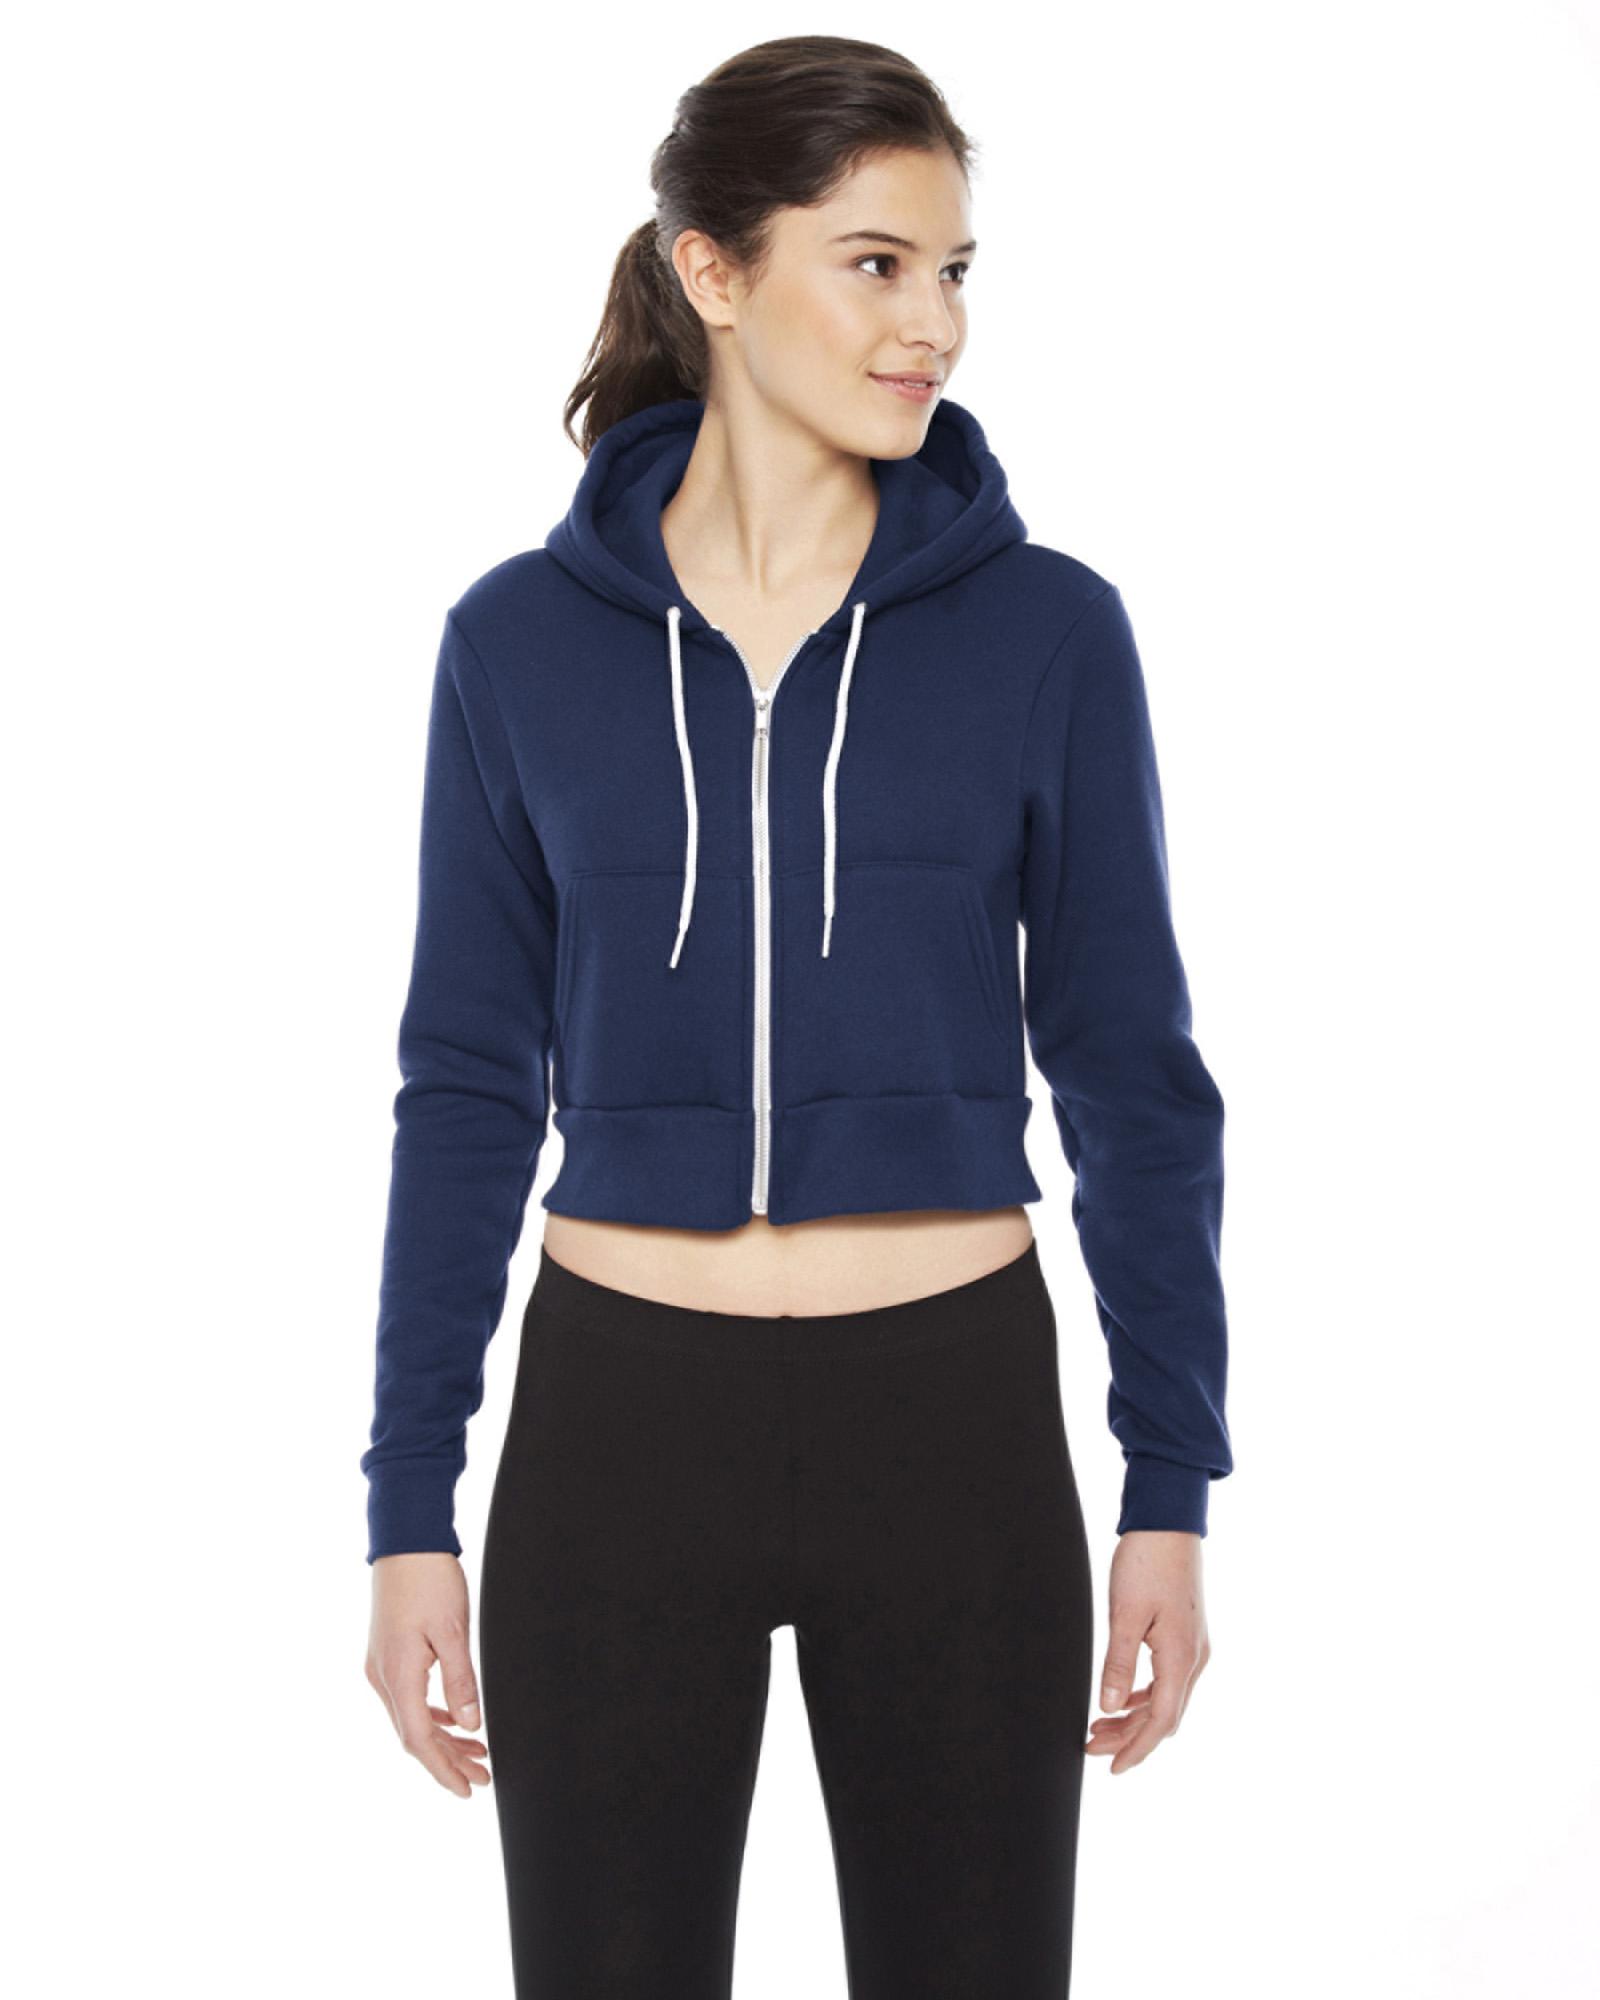 American apparel hoody